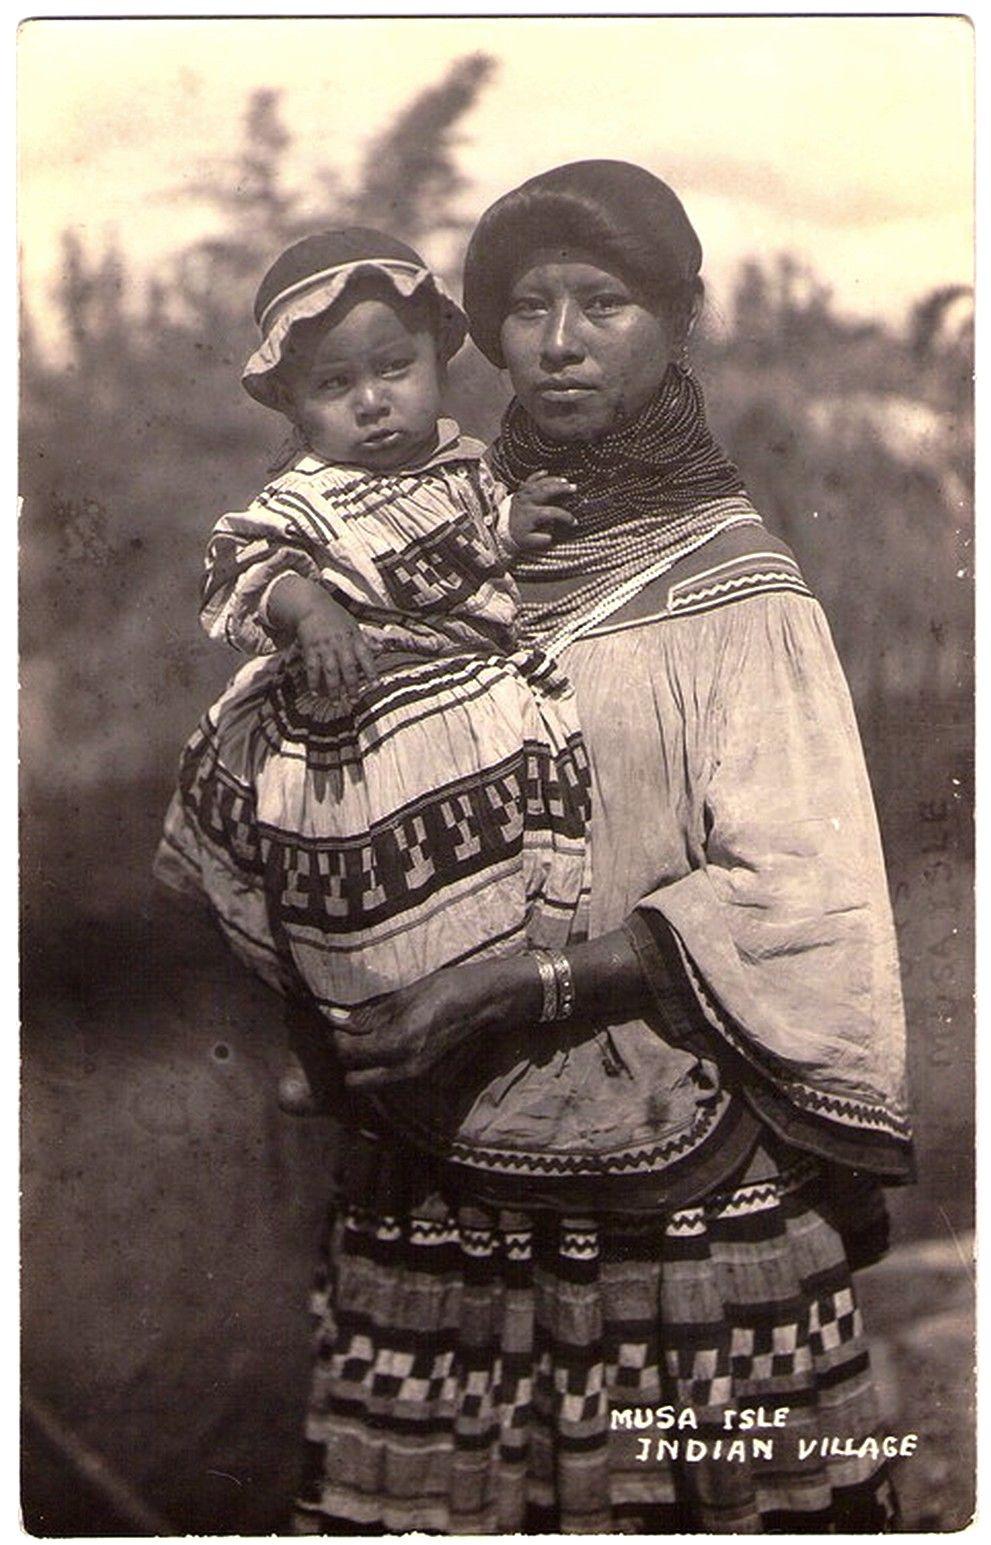 SEMINOLE Mother & child, Musa Isle Indian Village, Miami